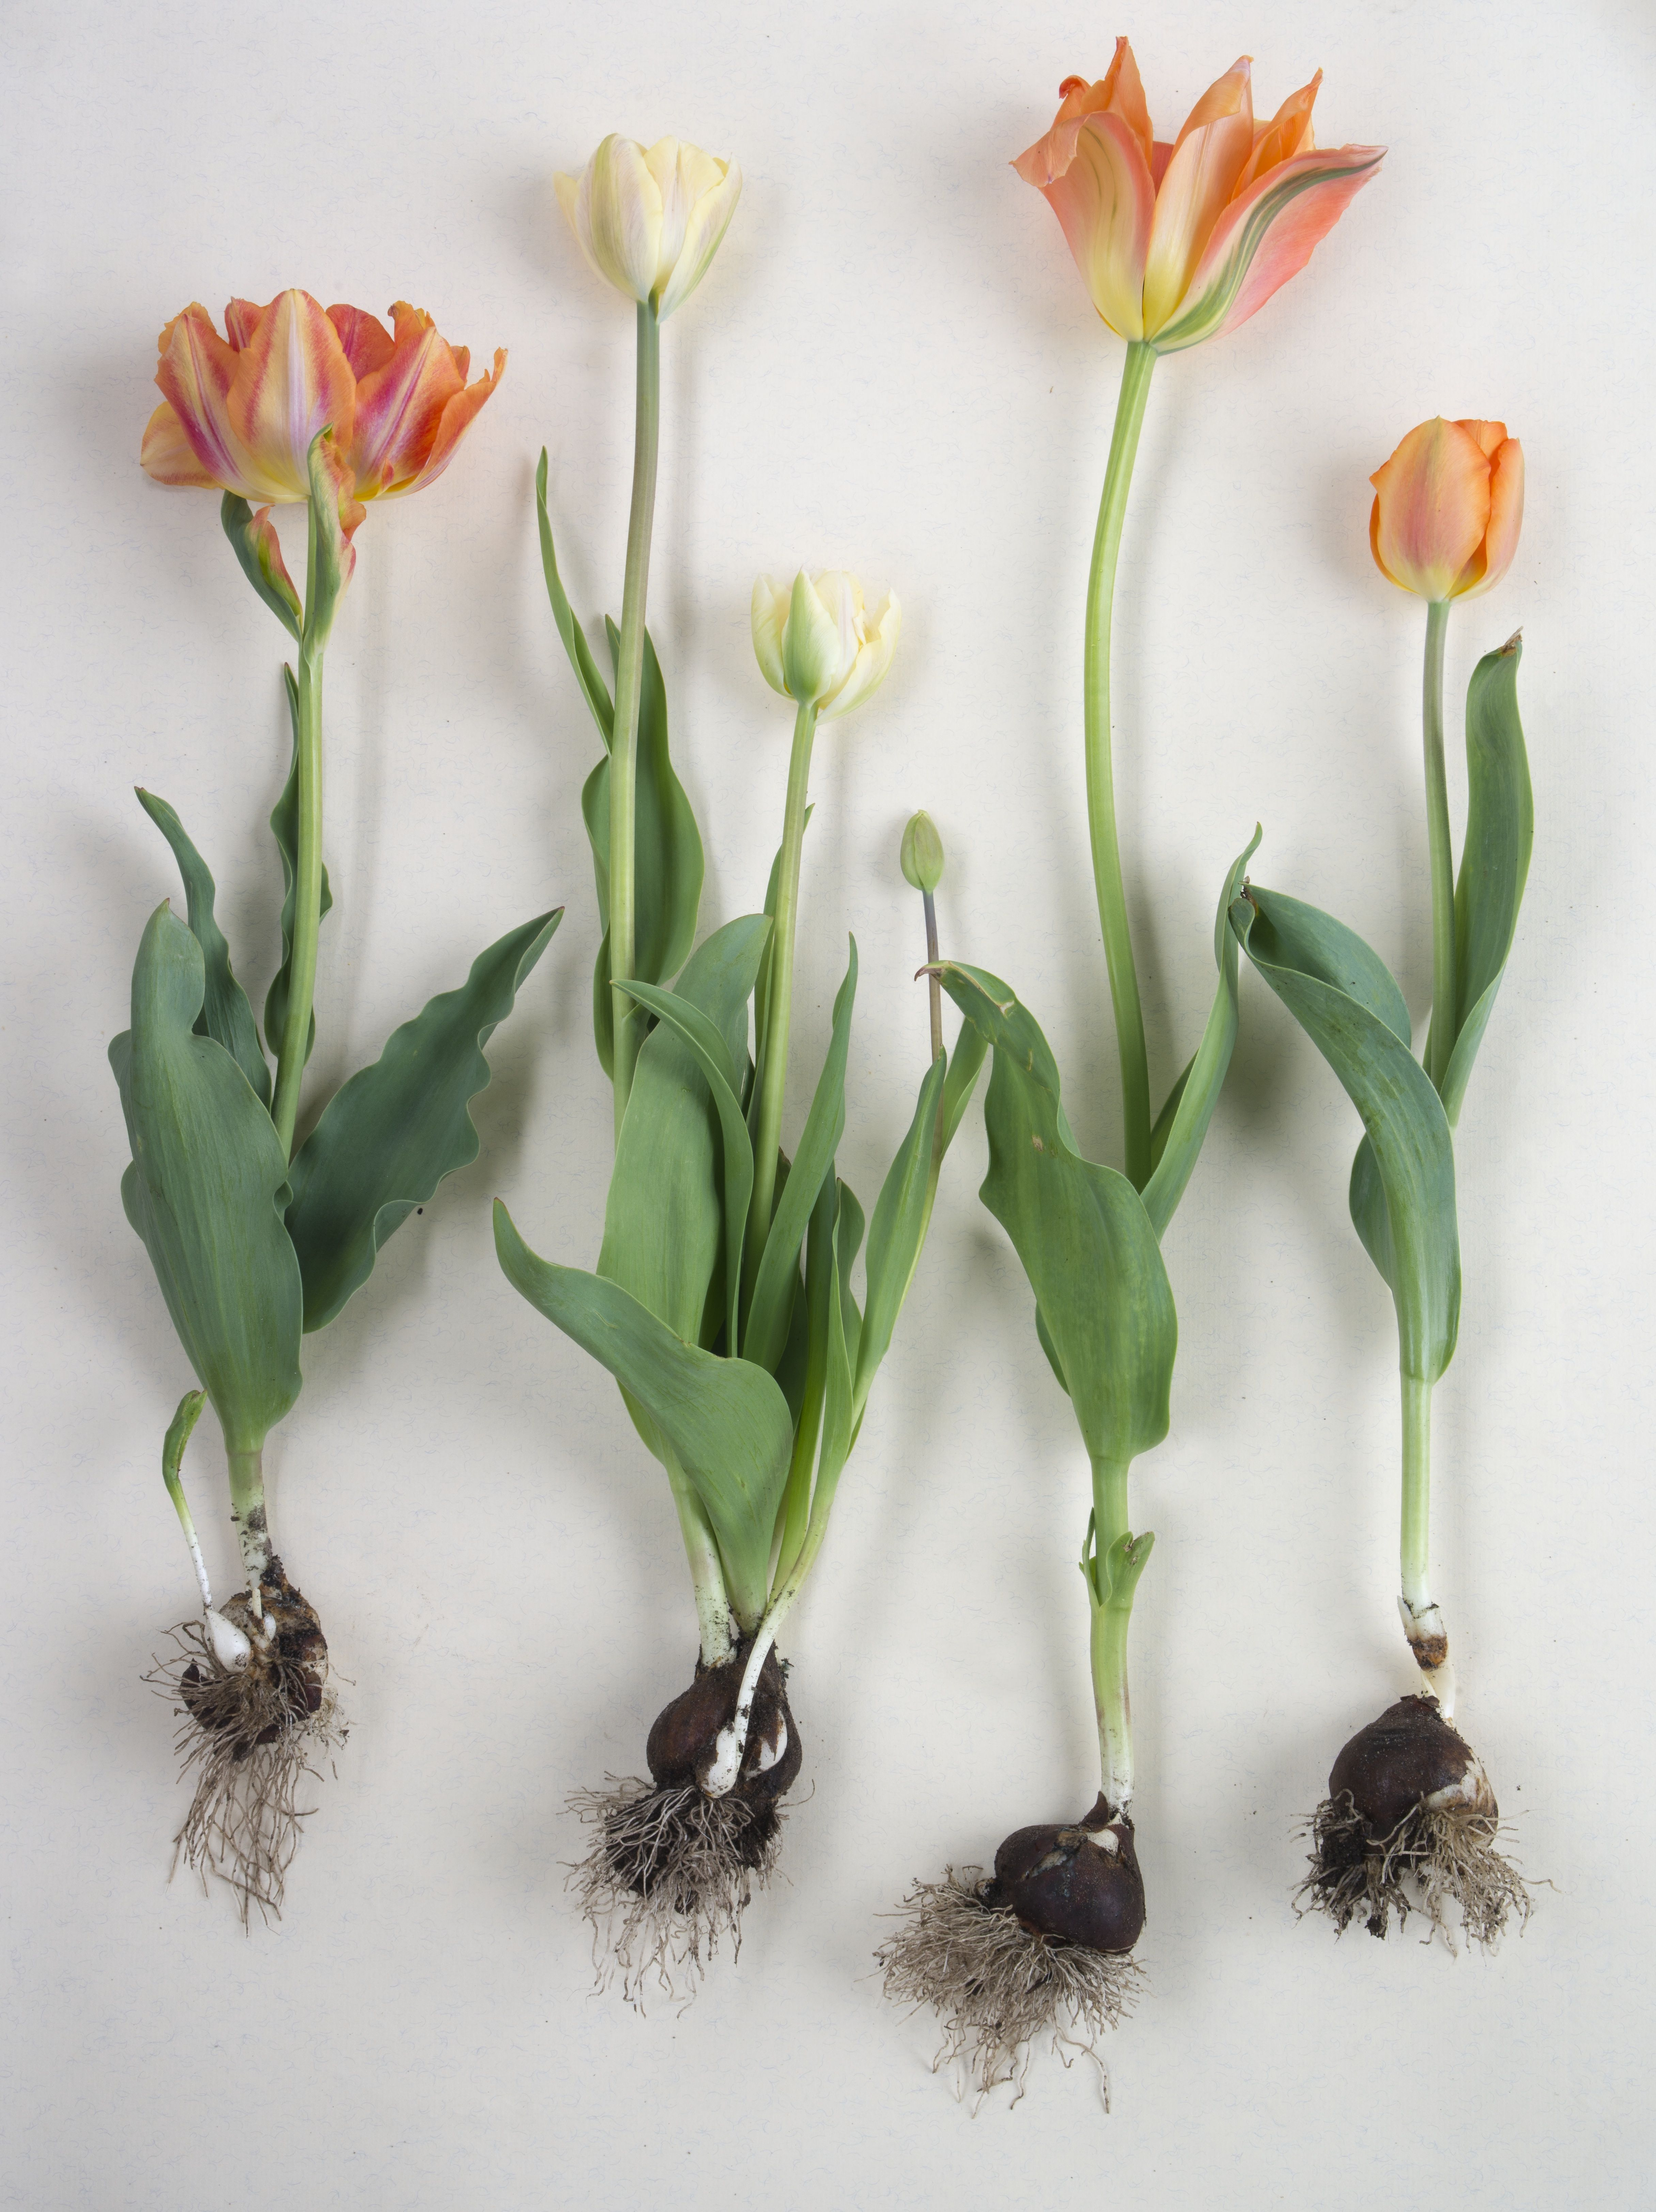 tulipa givenchy vanilla cream lily fire and lighting sun